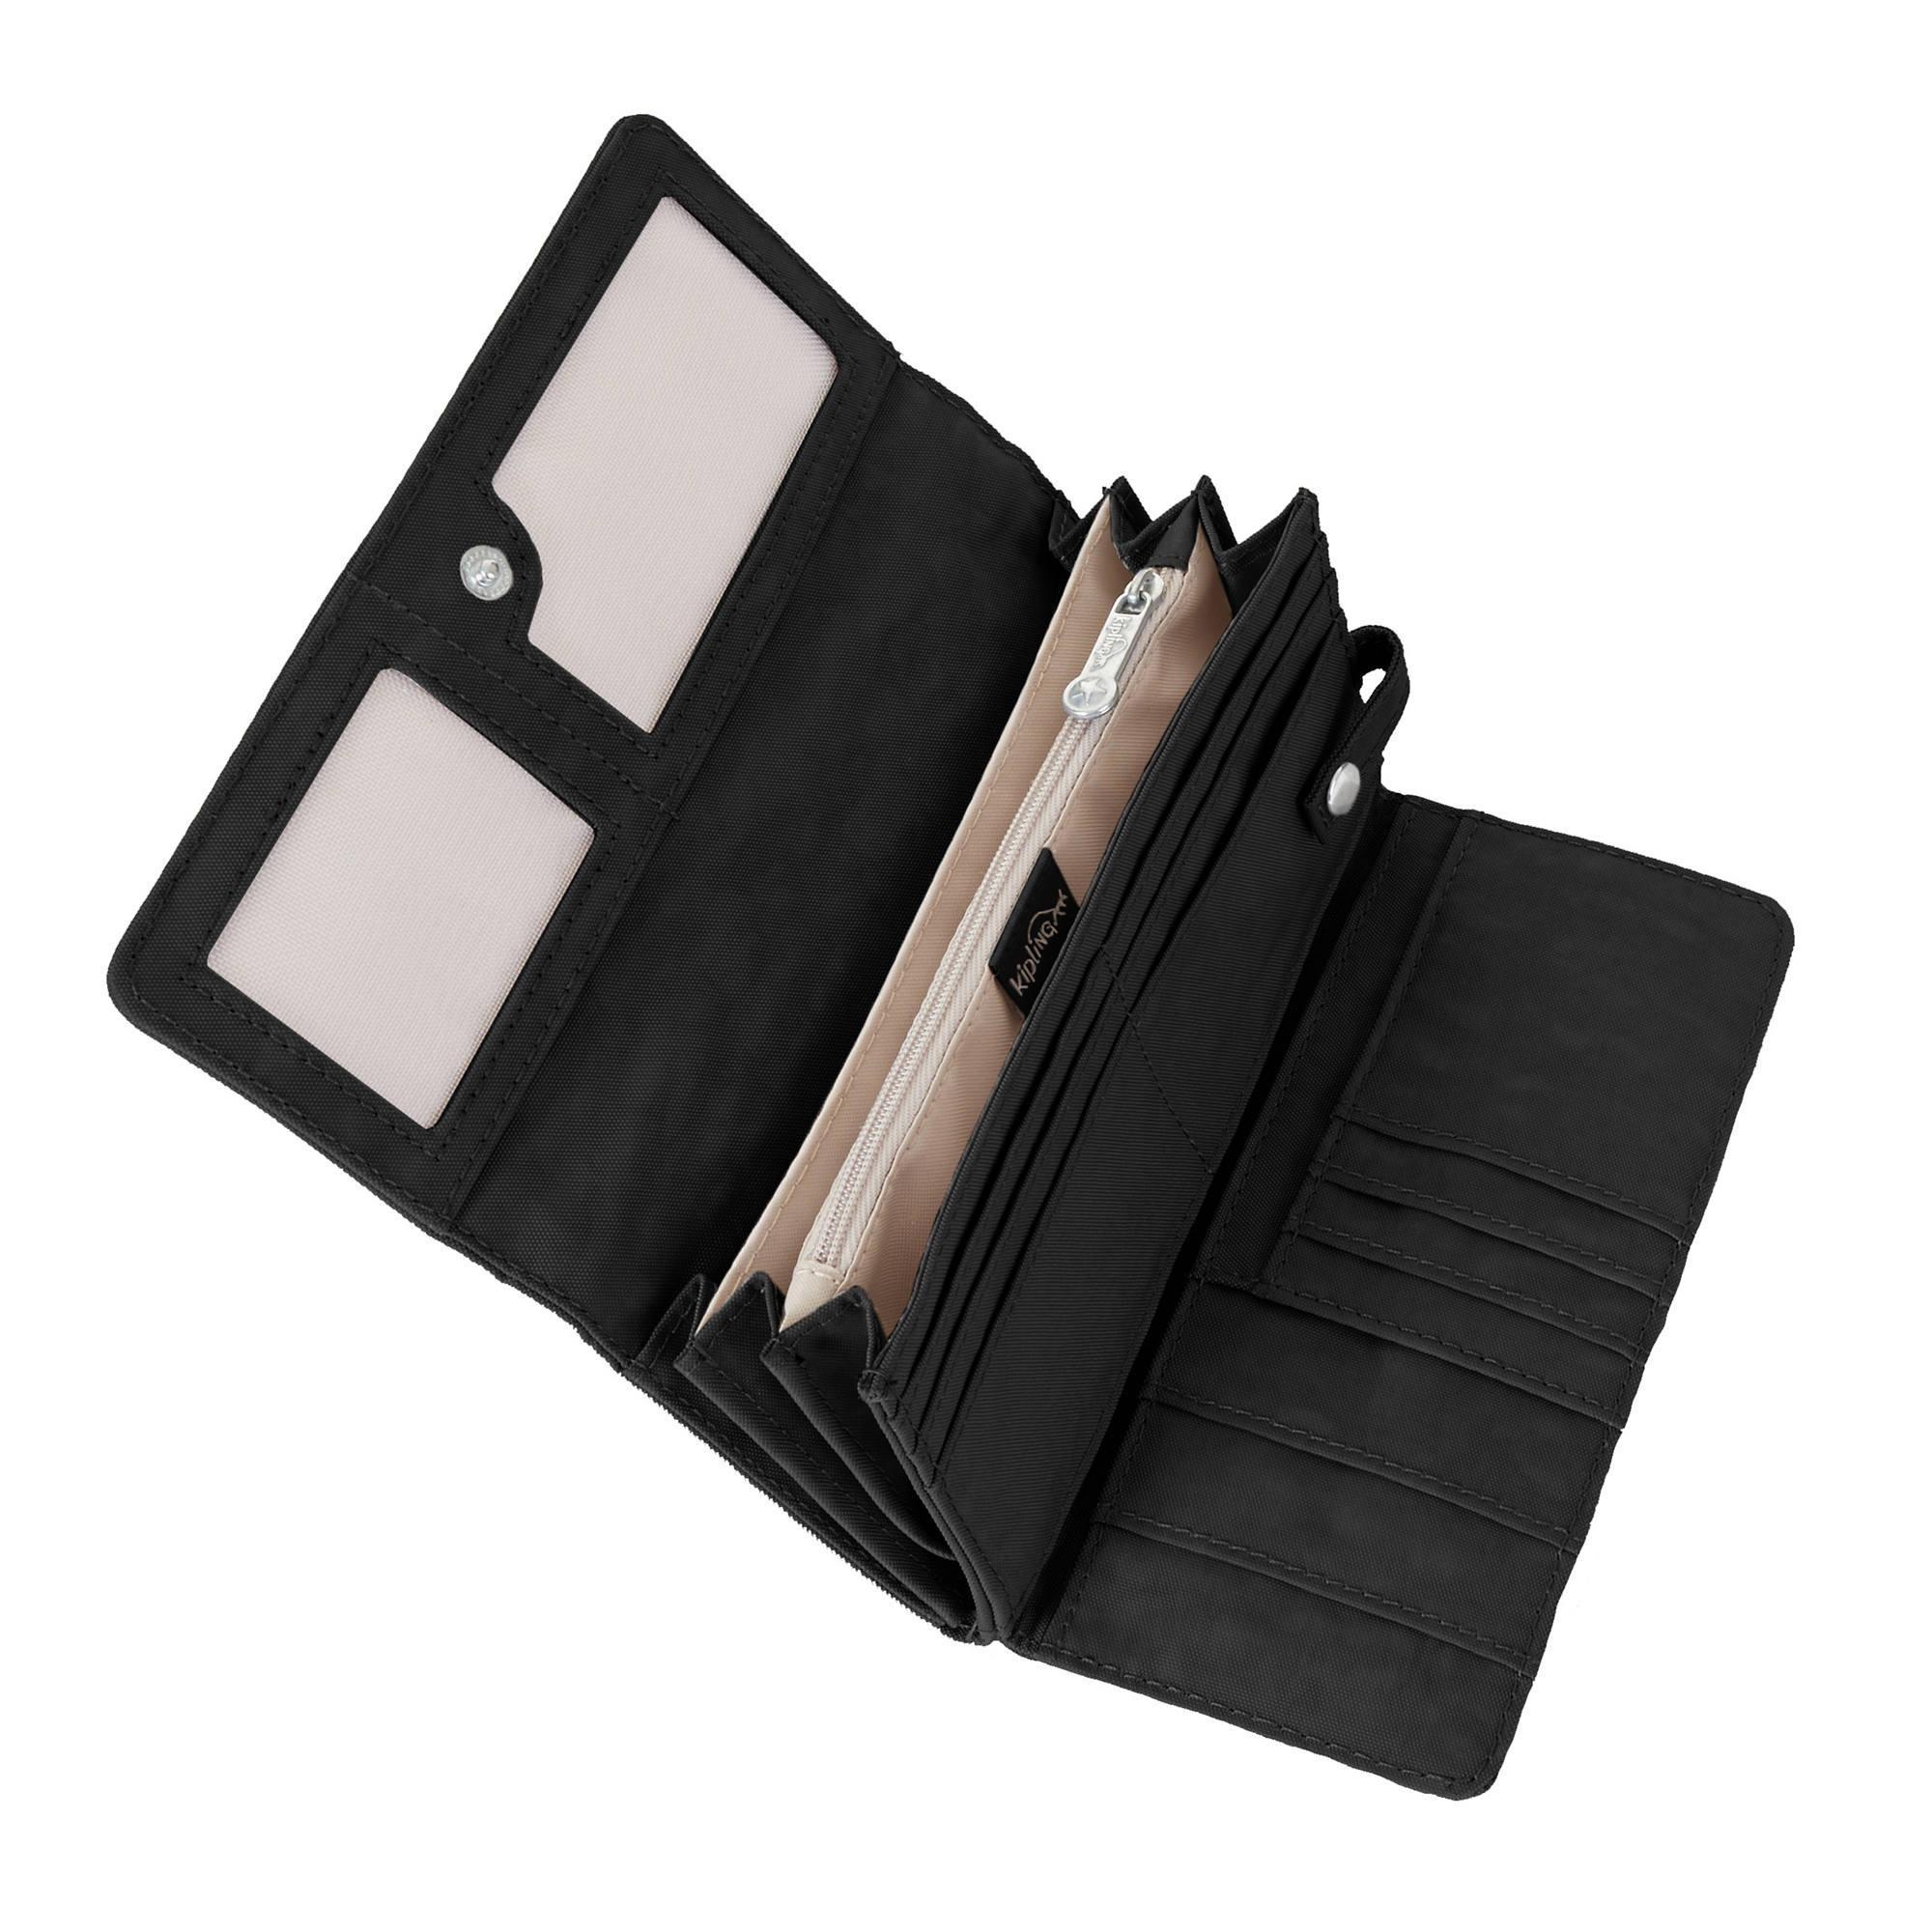 Promo Kipling New Teddi Wallet Black